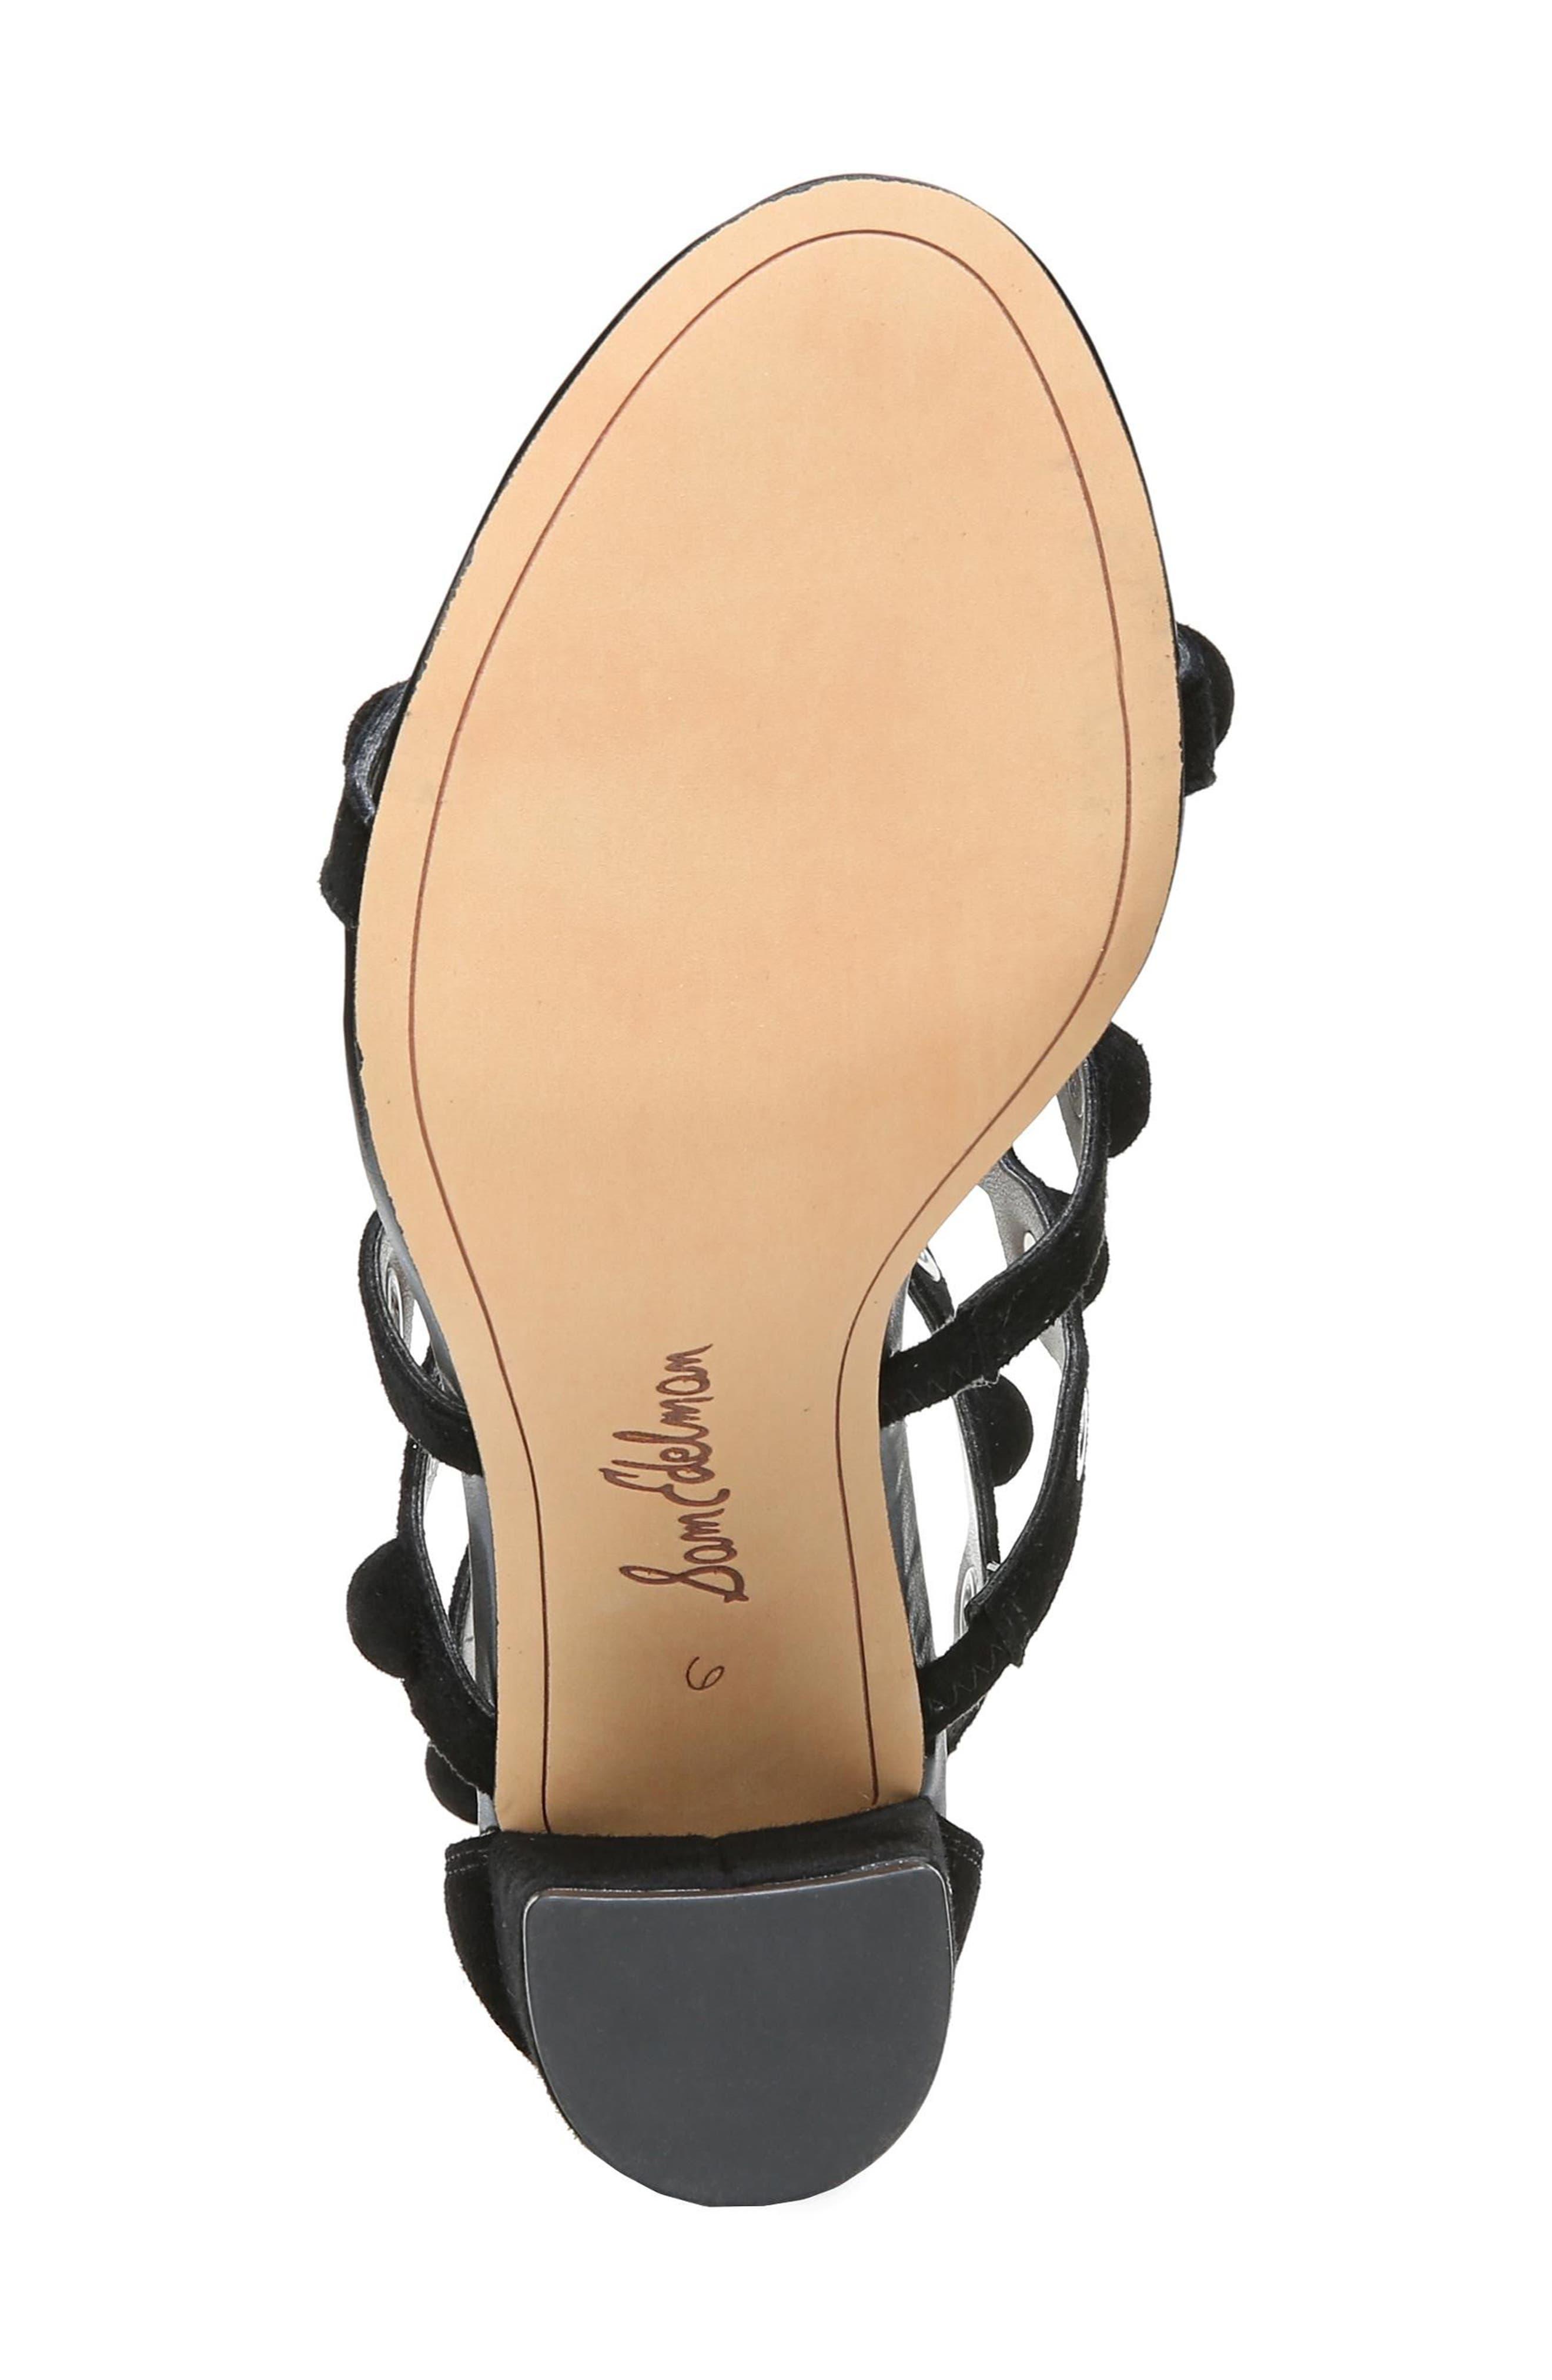 Yuli Grommet Sandal,                             Alternate thumbnail 7, color,                             Black Leather